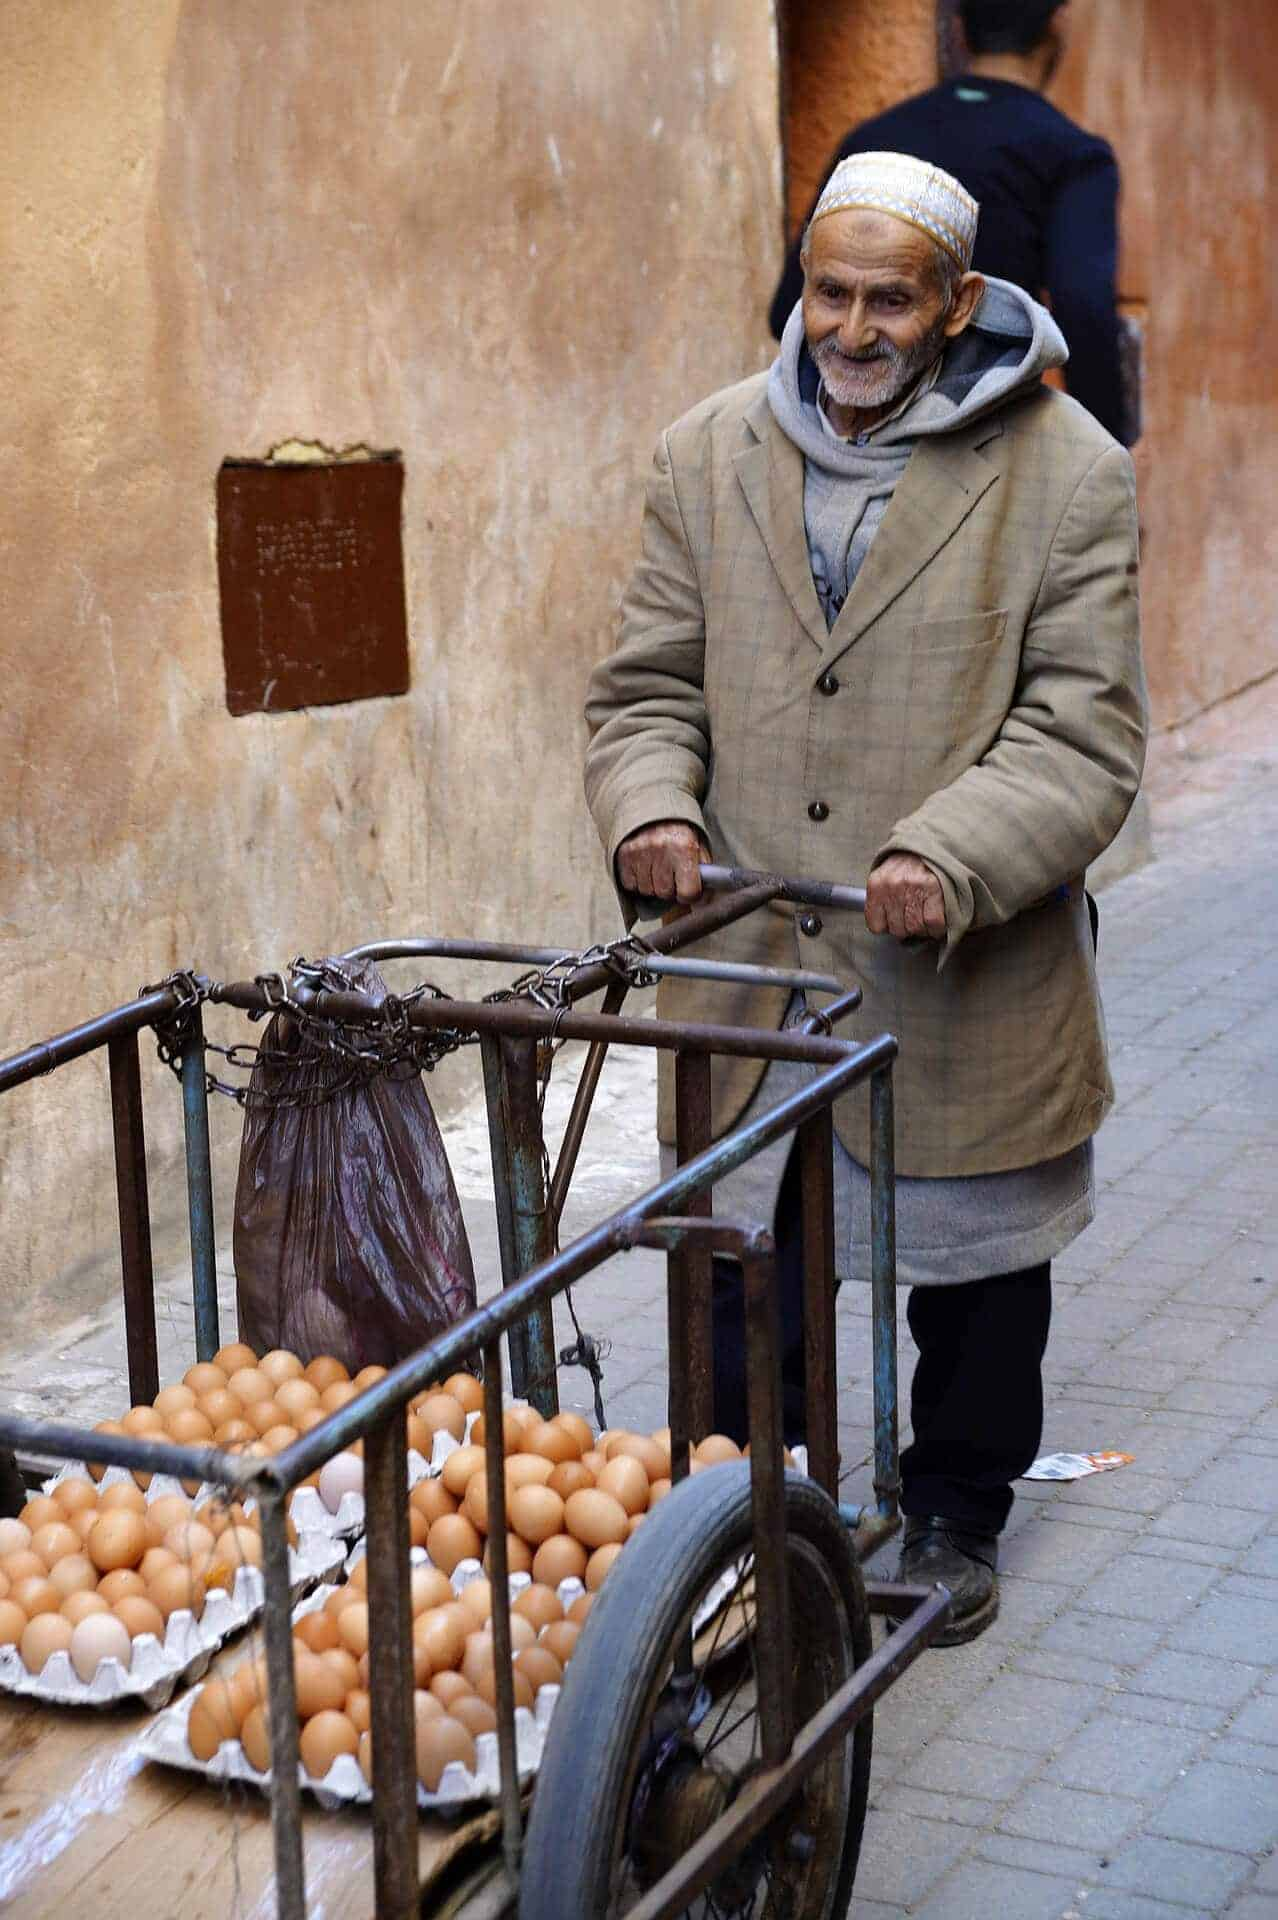 morocco-1103048_1920-edited